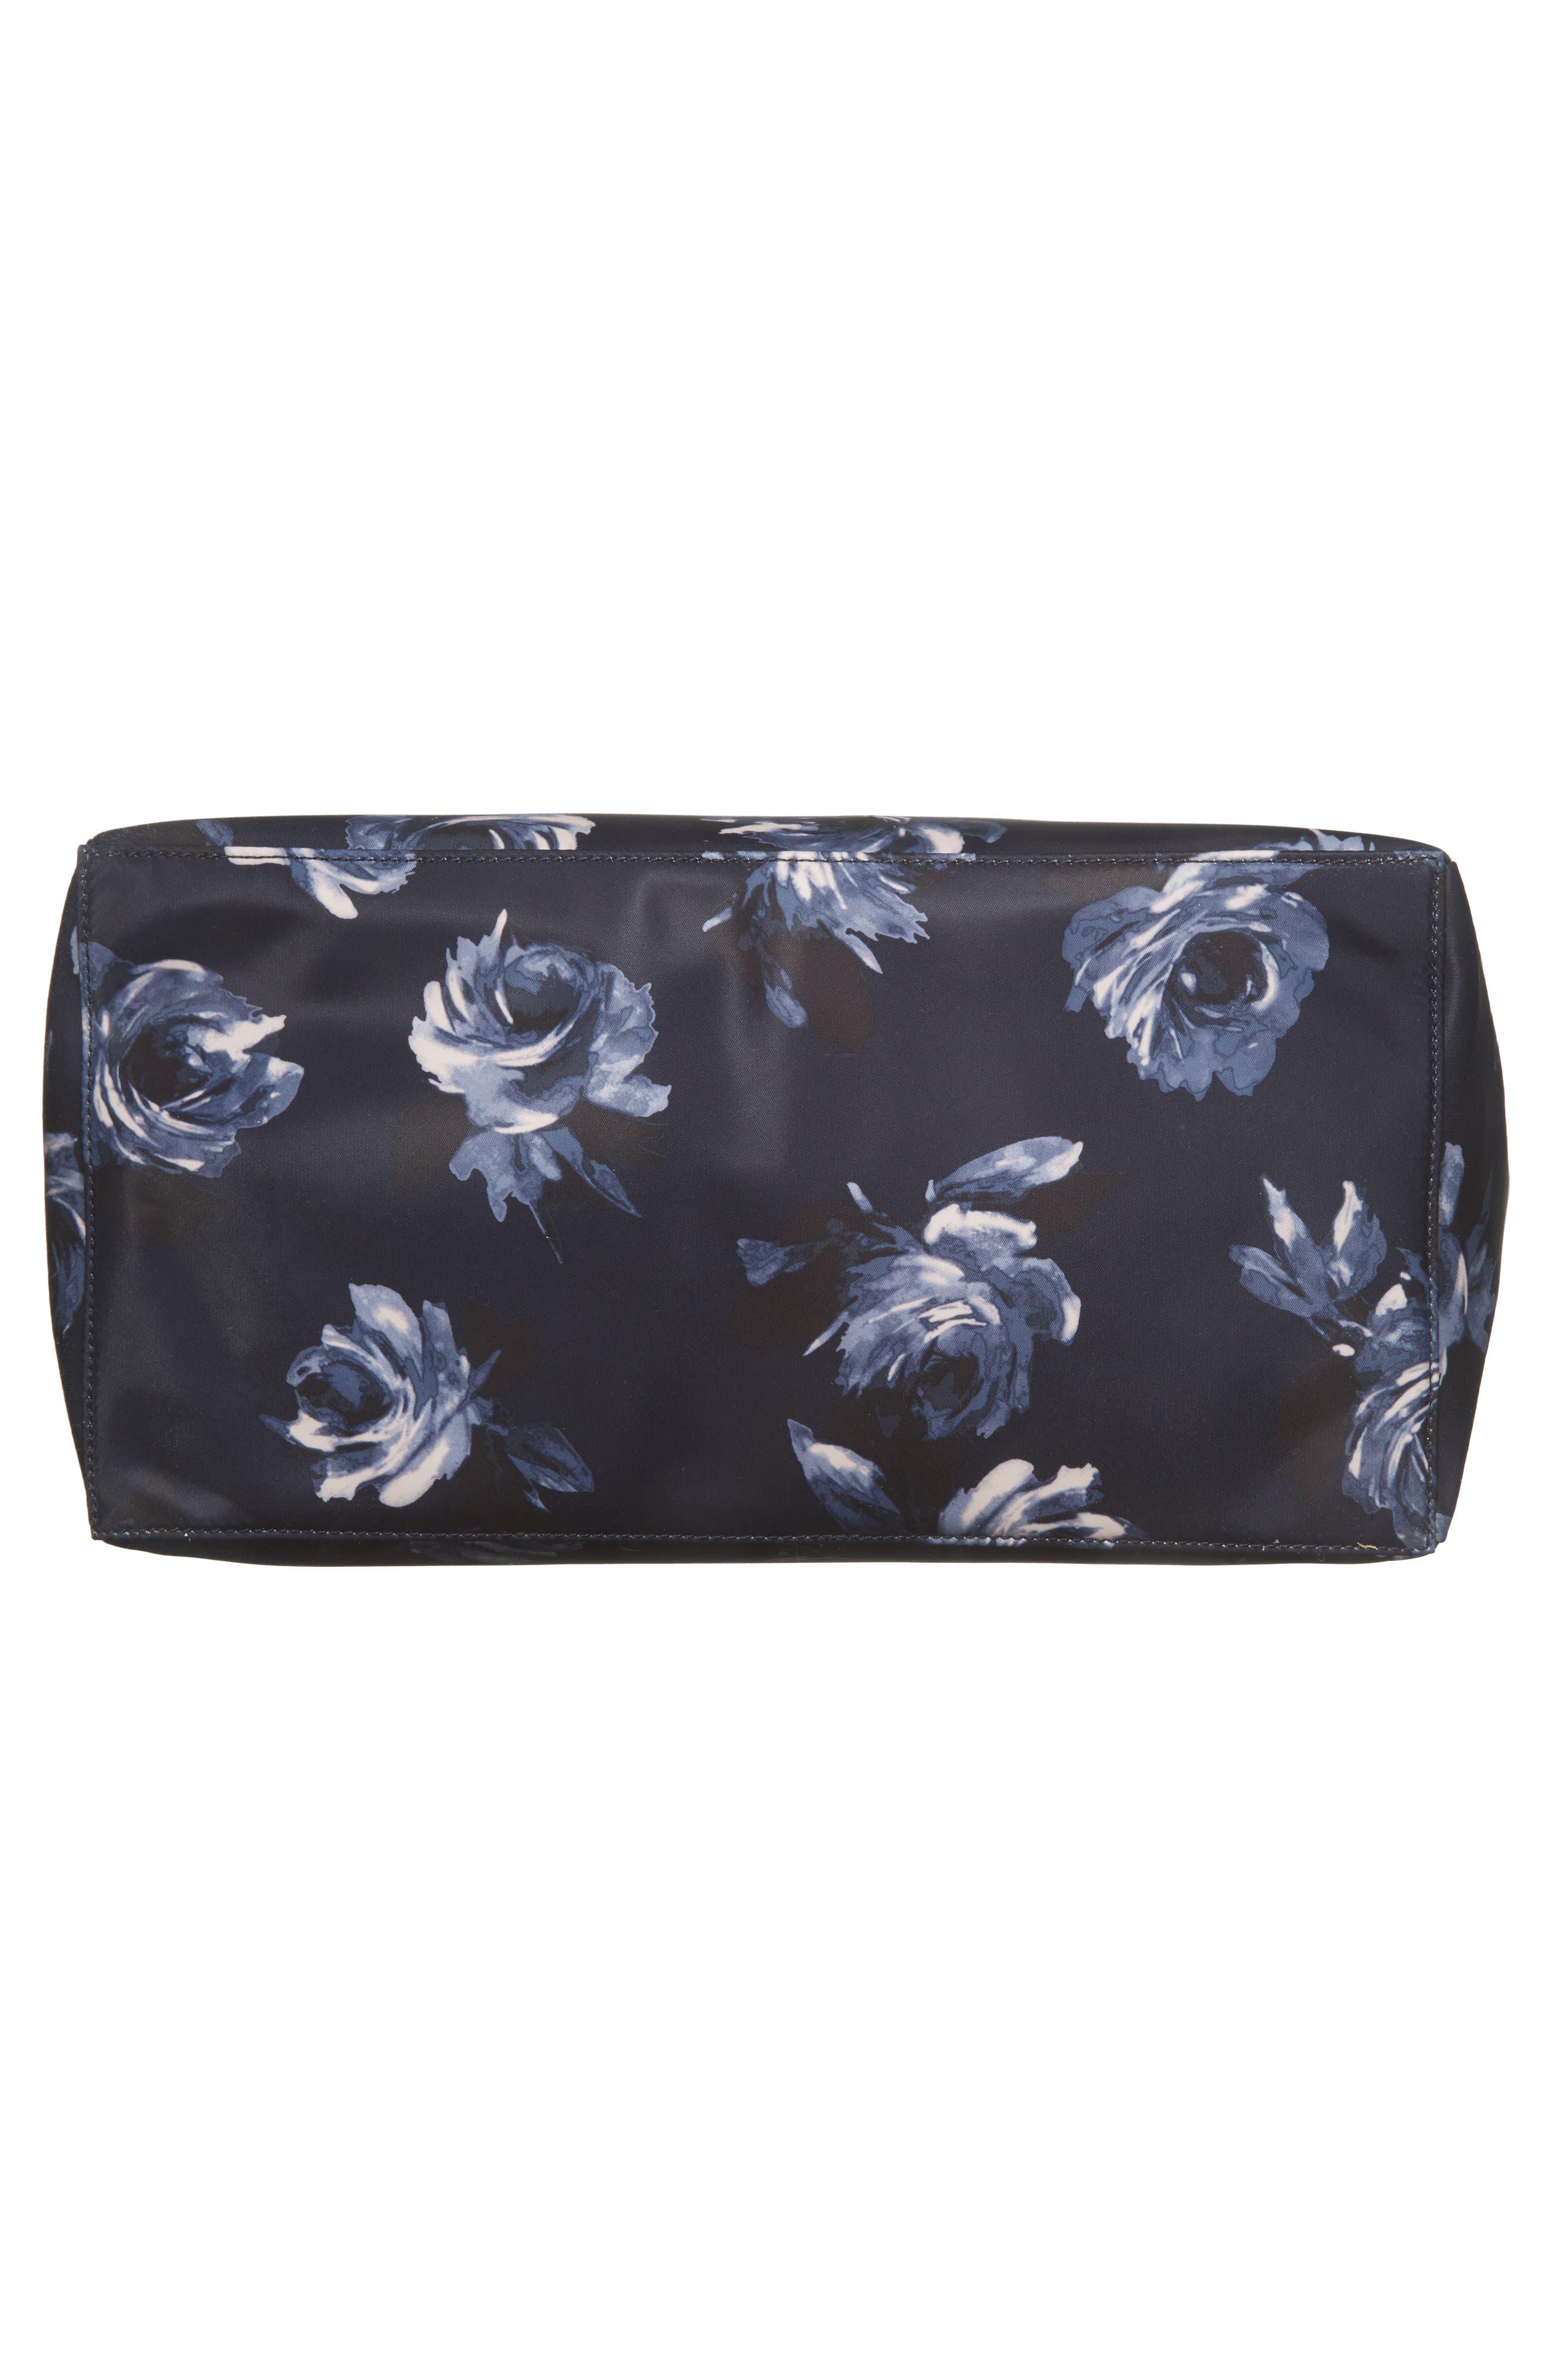 watson lane night rose betheny nylon diaper bag,                             Alternate thumbnail 6, color,                             Night Rose